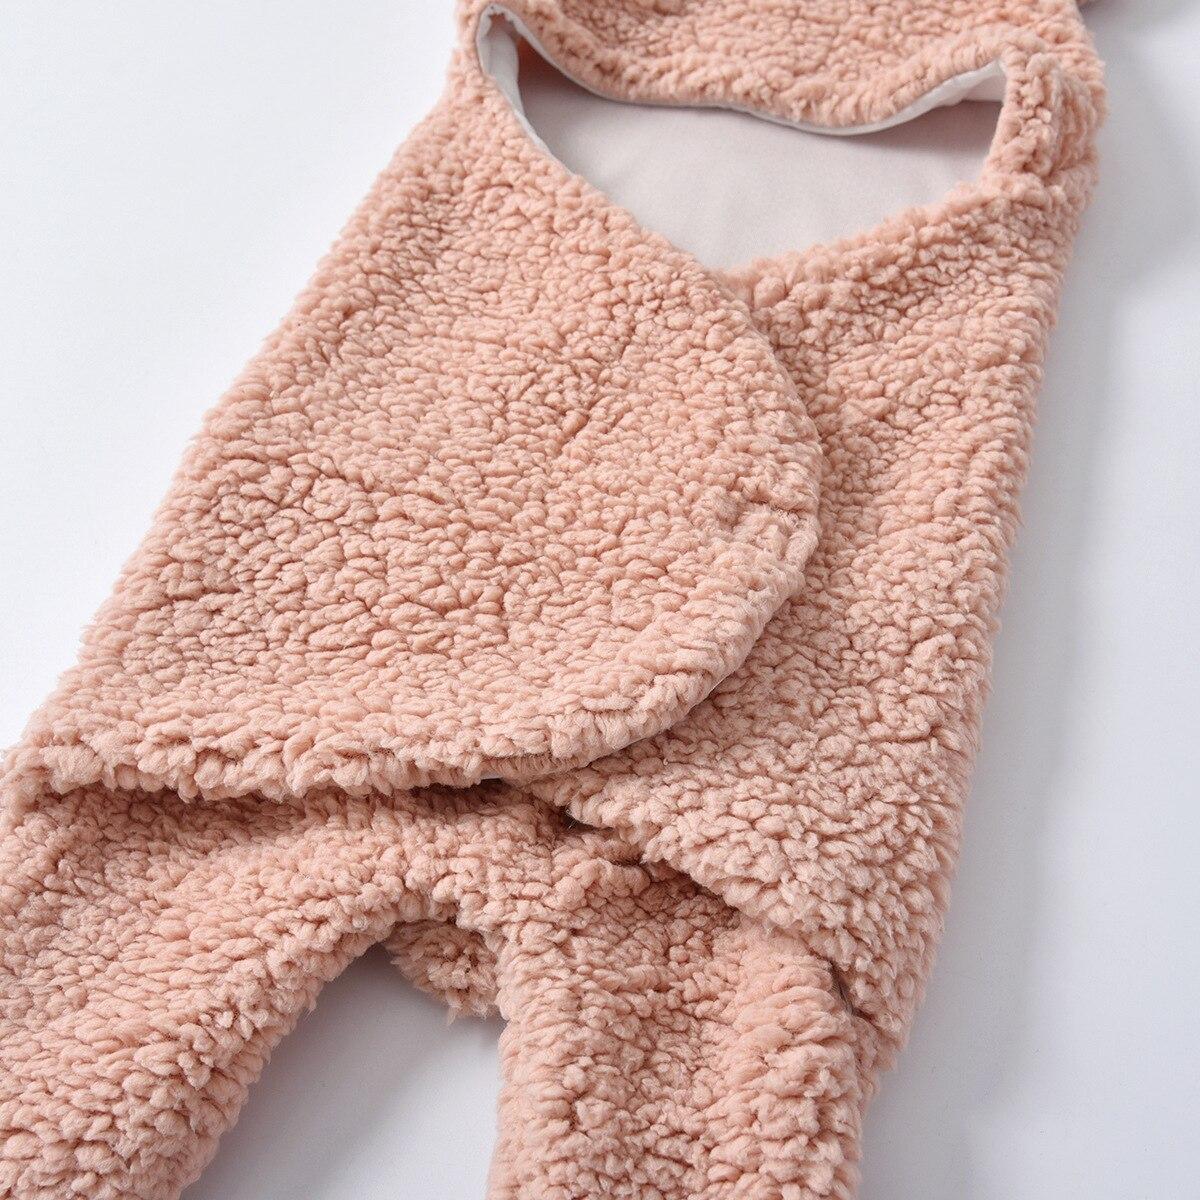 Primavera outono bebê swaddling macio quente cobertor